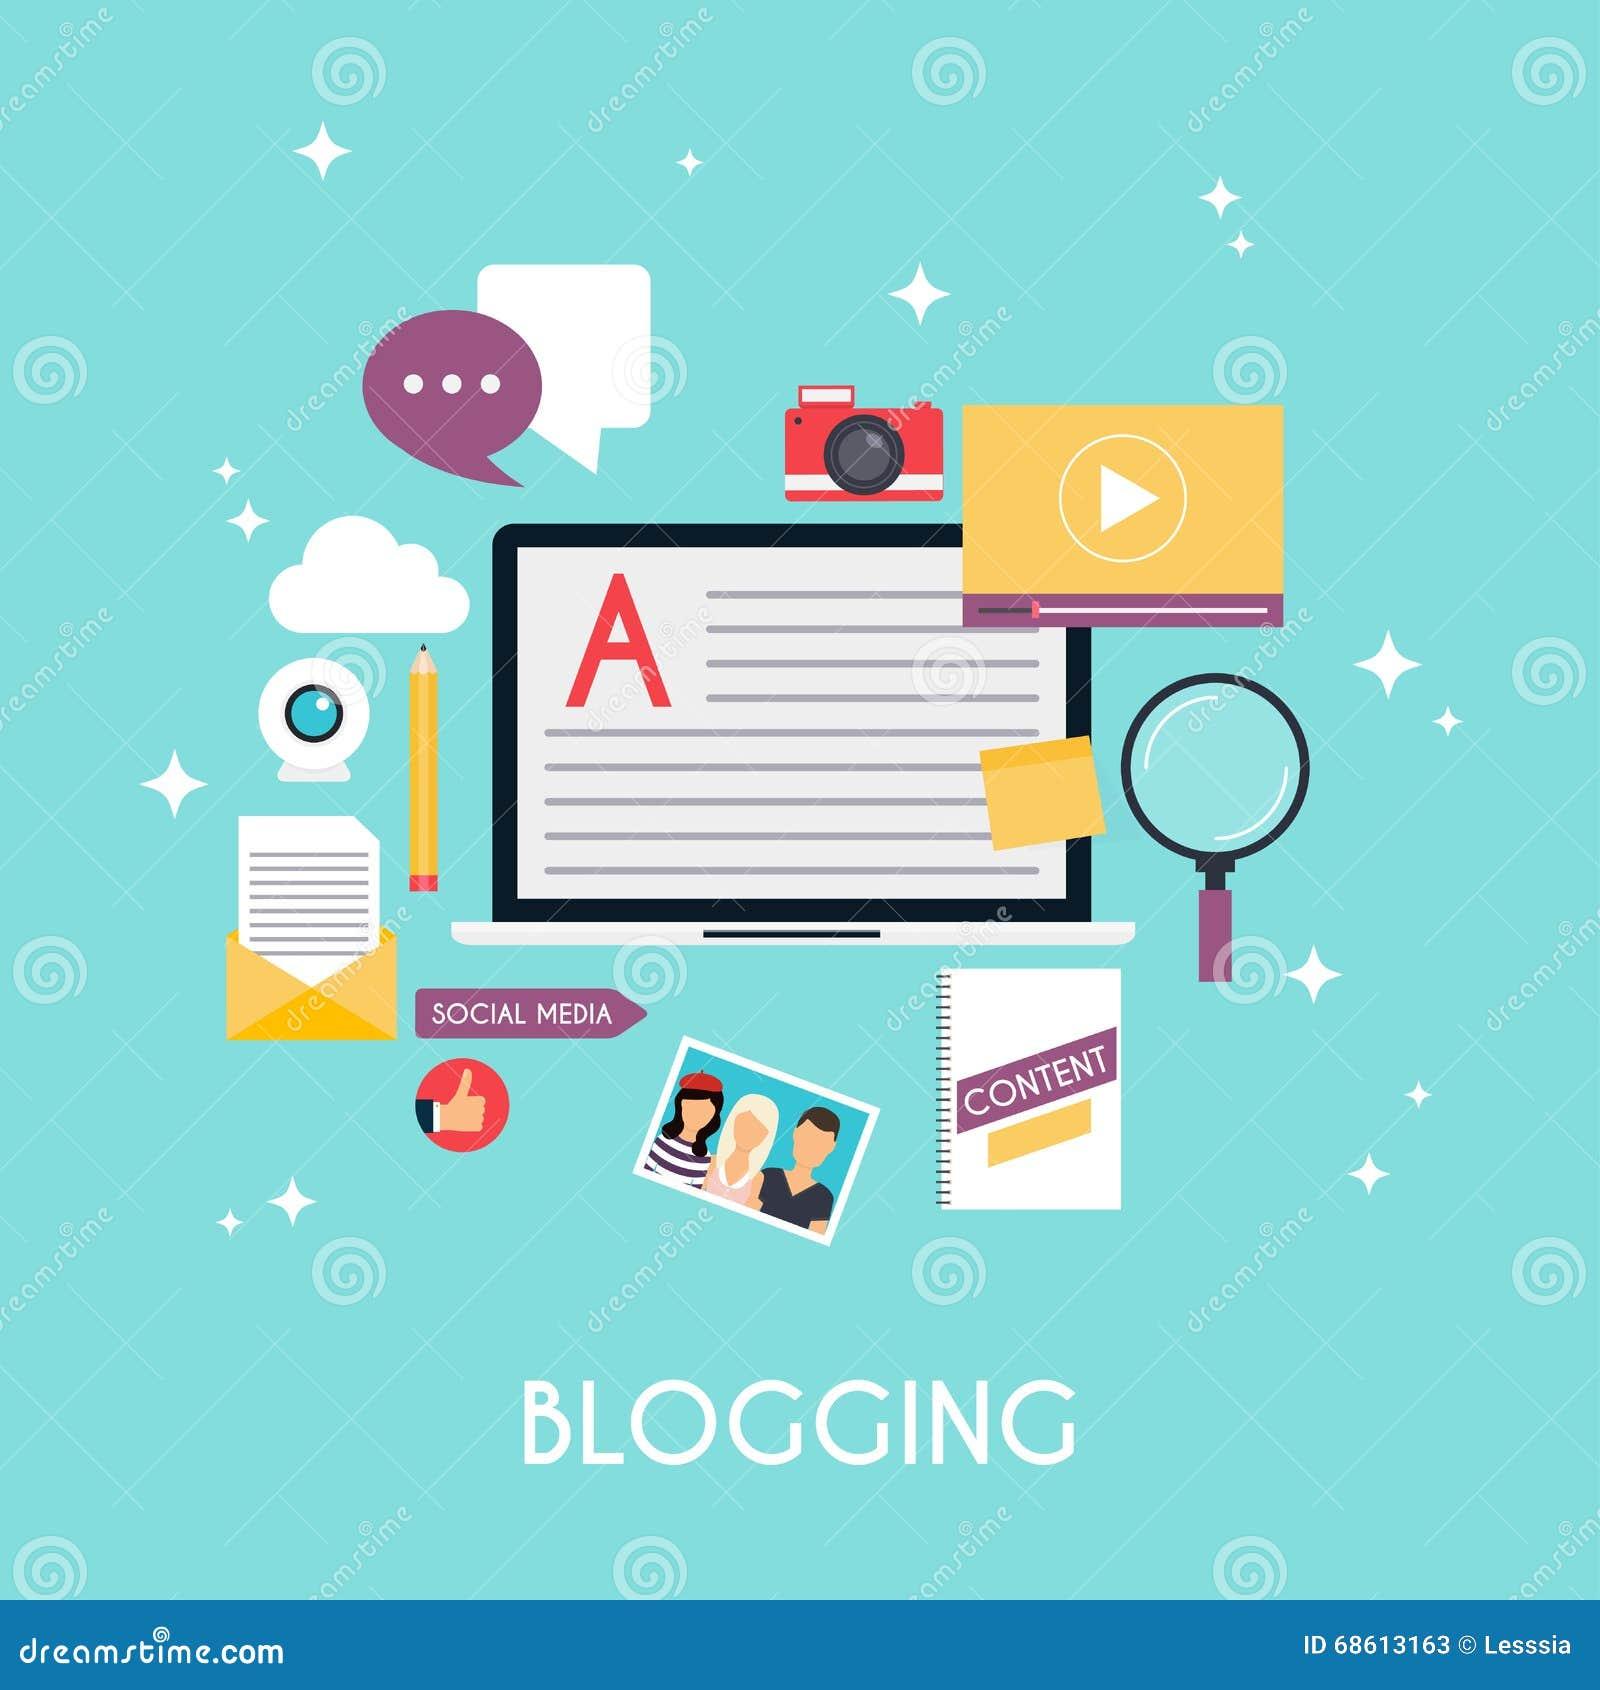 Template blogging infographics. Blog concept design. Flat design